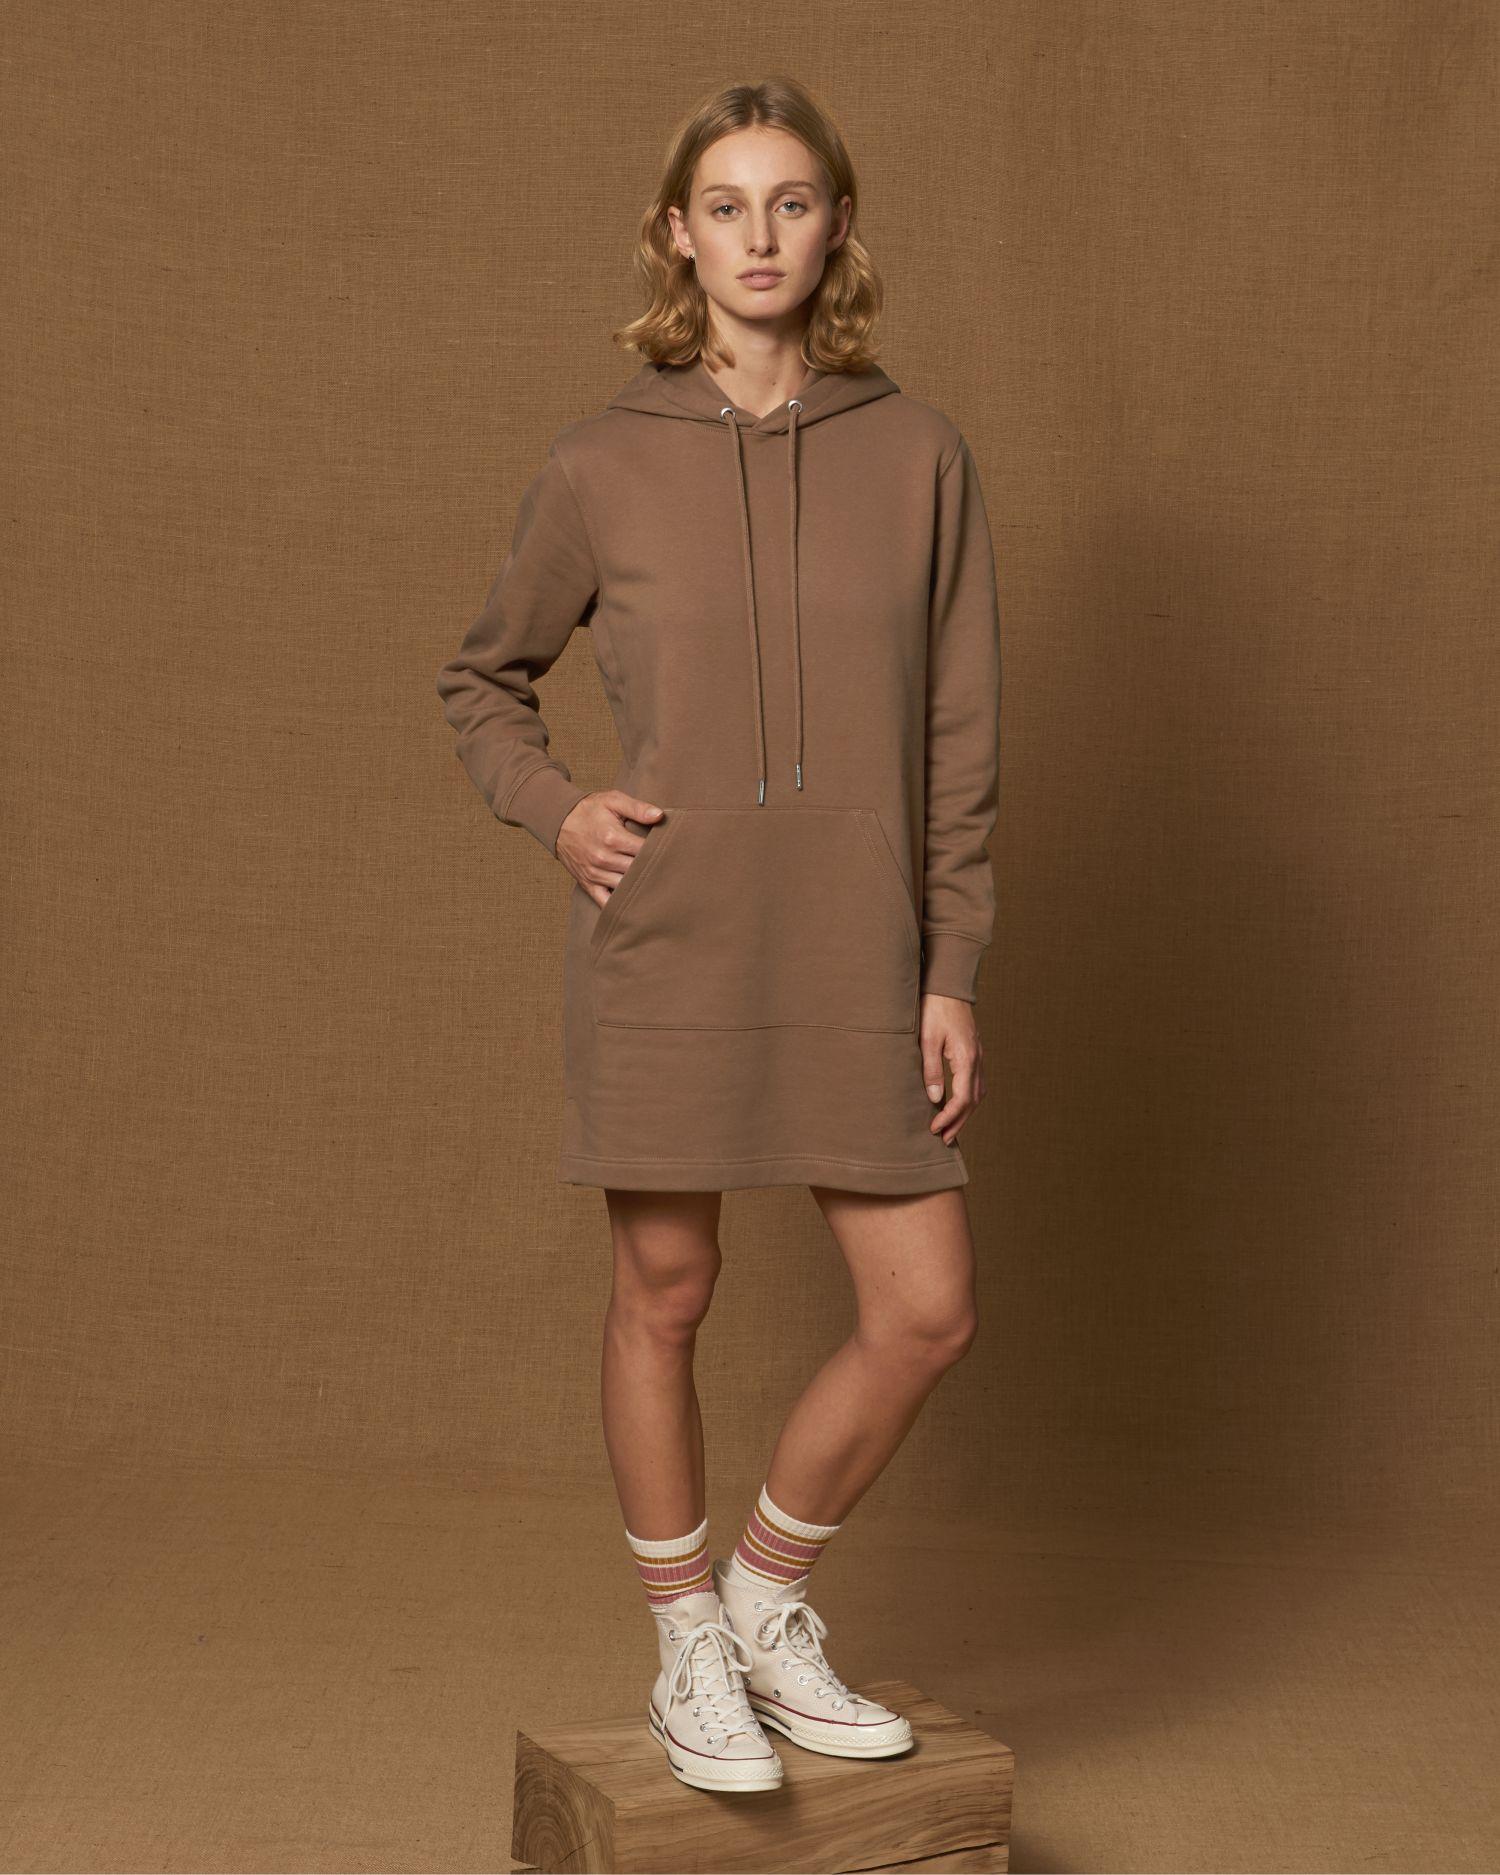 Stella Streeter - La robe sweat-shirt à capuche